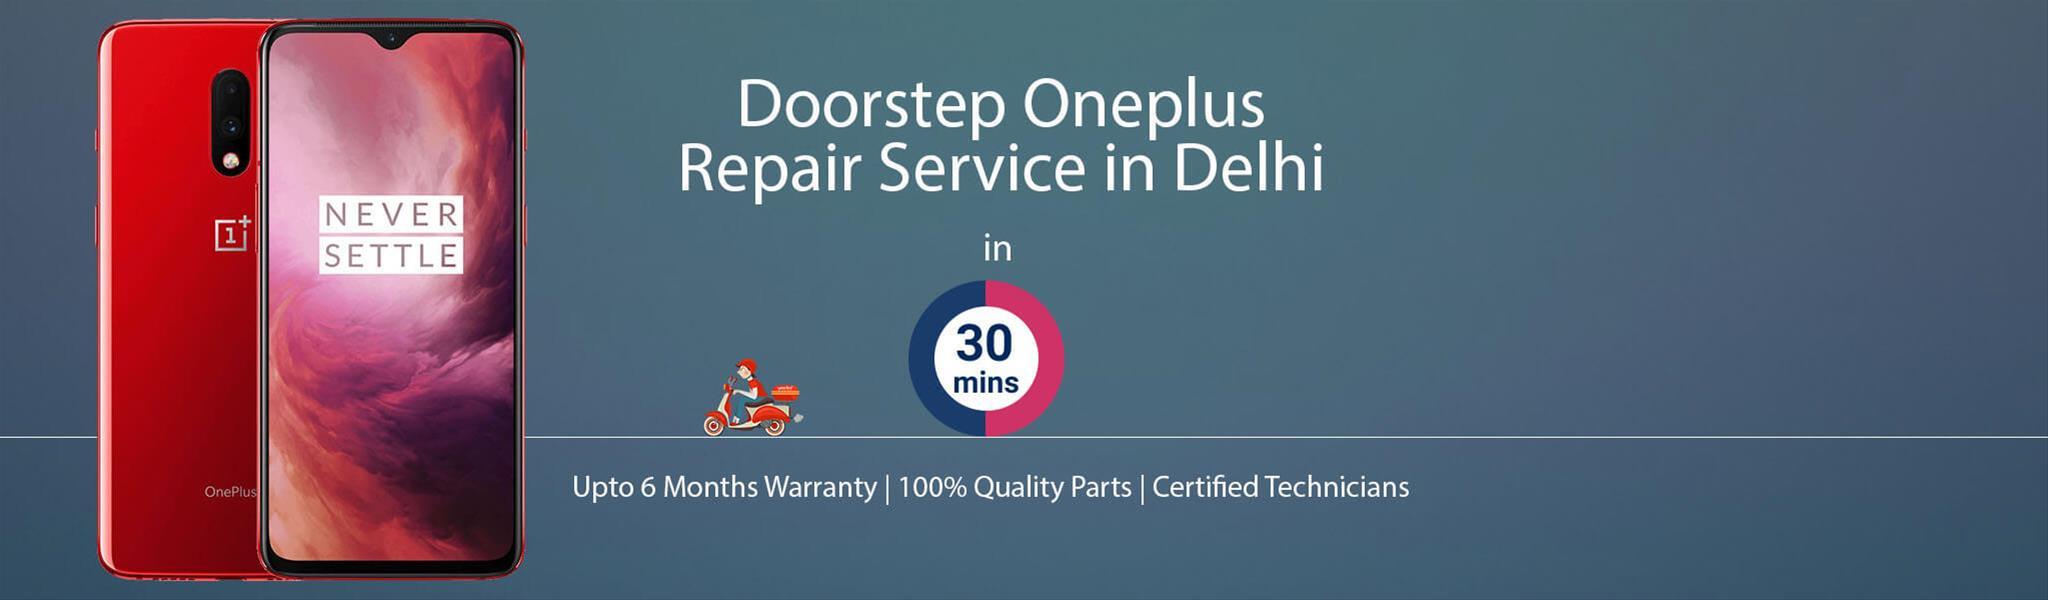 oneplus-repair-service-banner-delhi.jpg